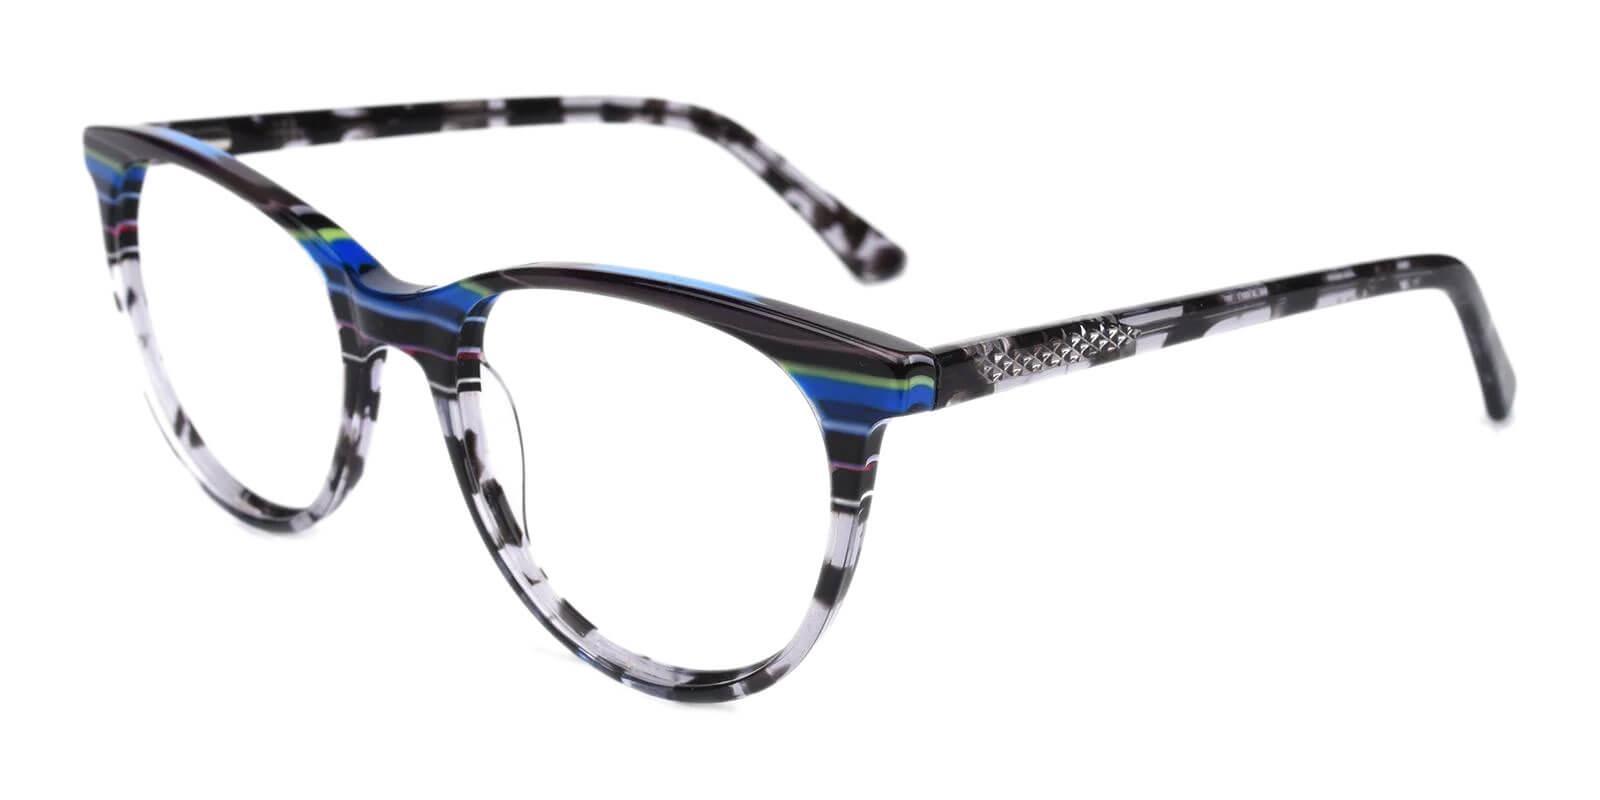 Perceive Black Acetate Eyeglasses , SpringHinges , UniversalBridgeFit Frames from ABBE Glasses